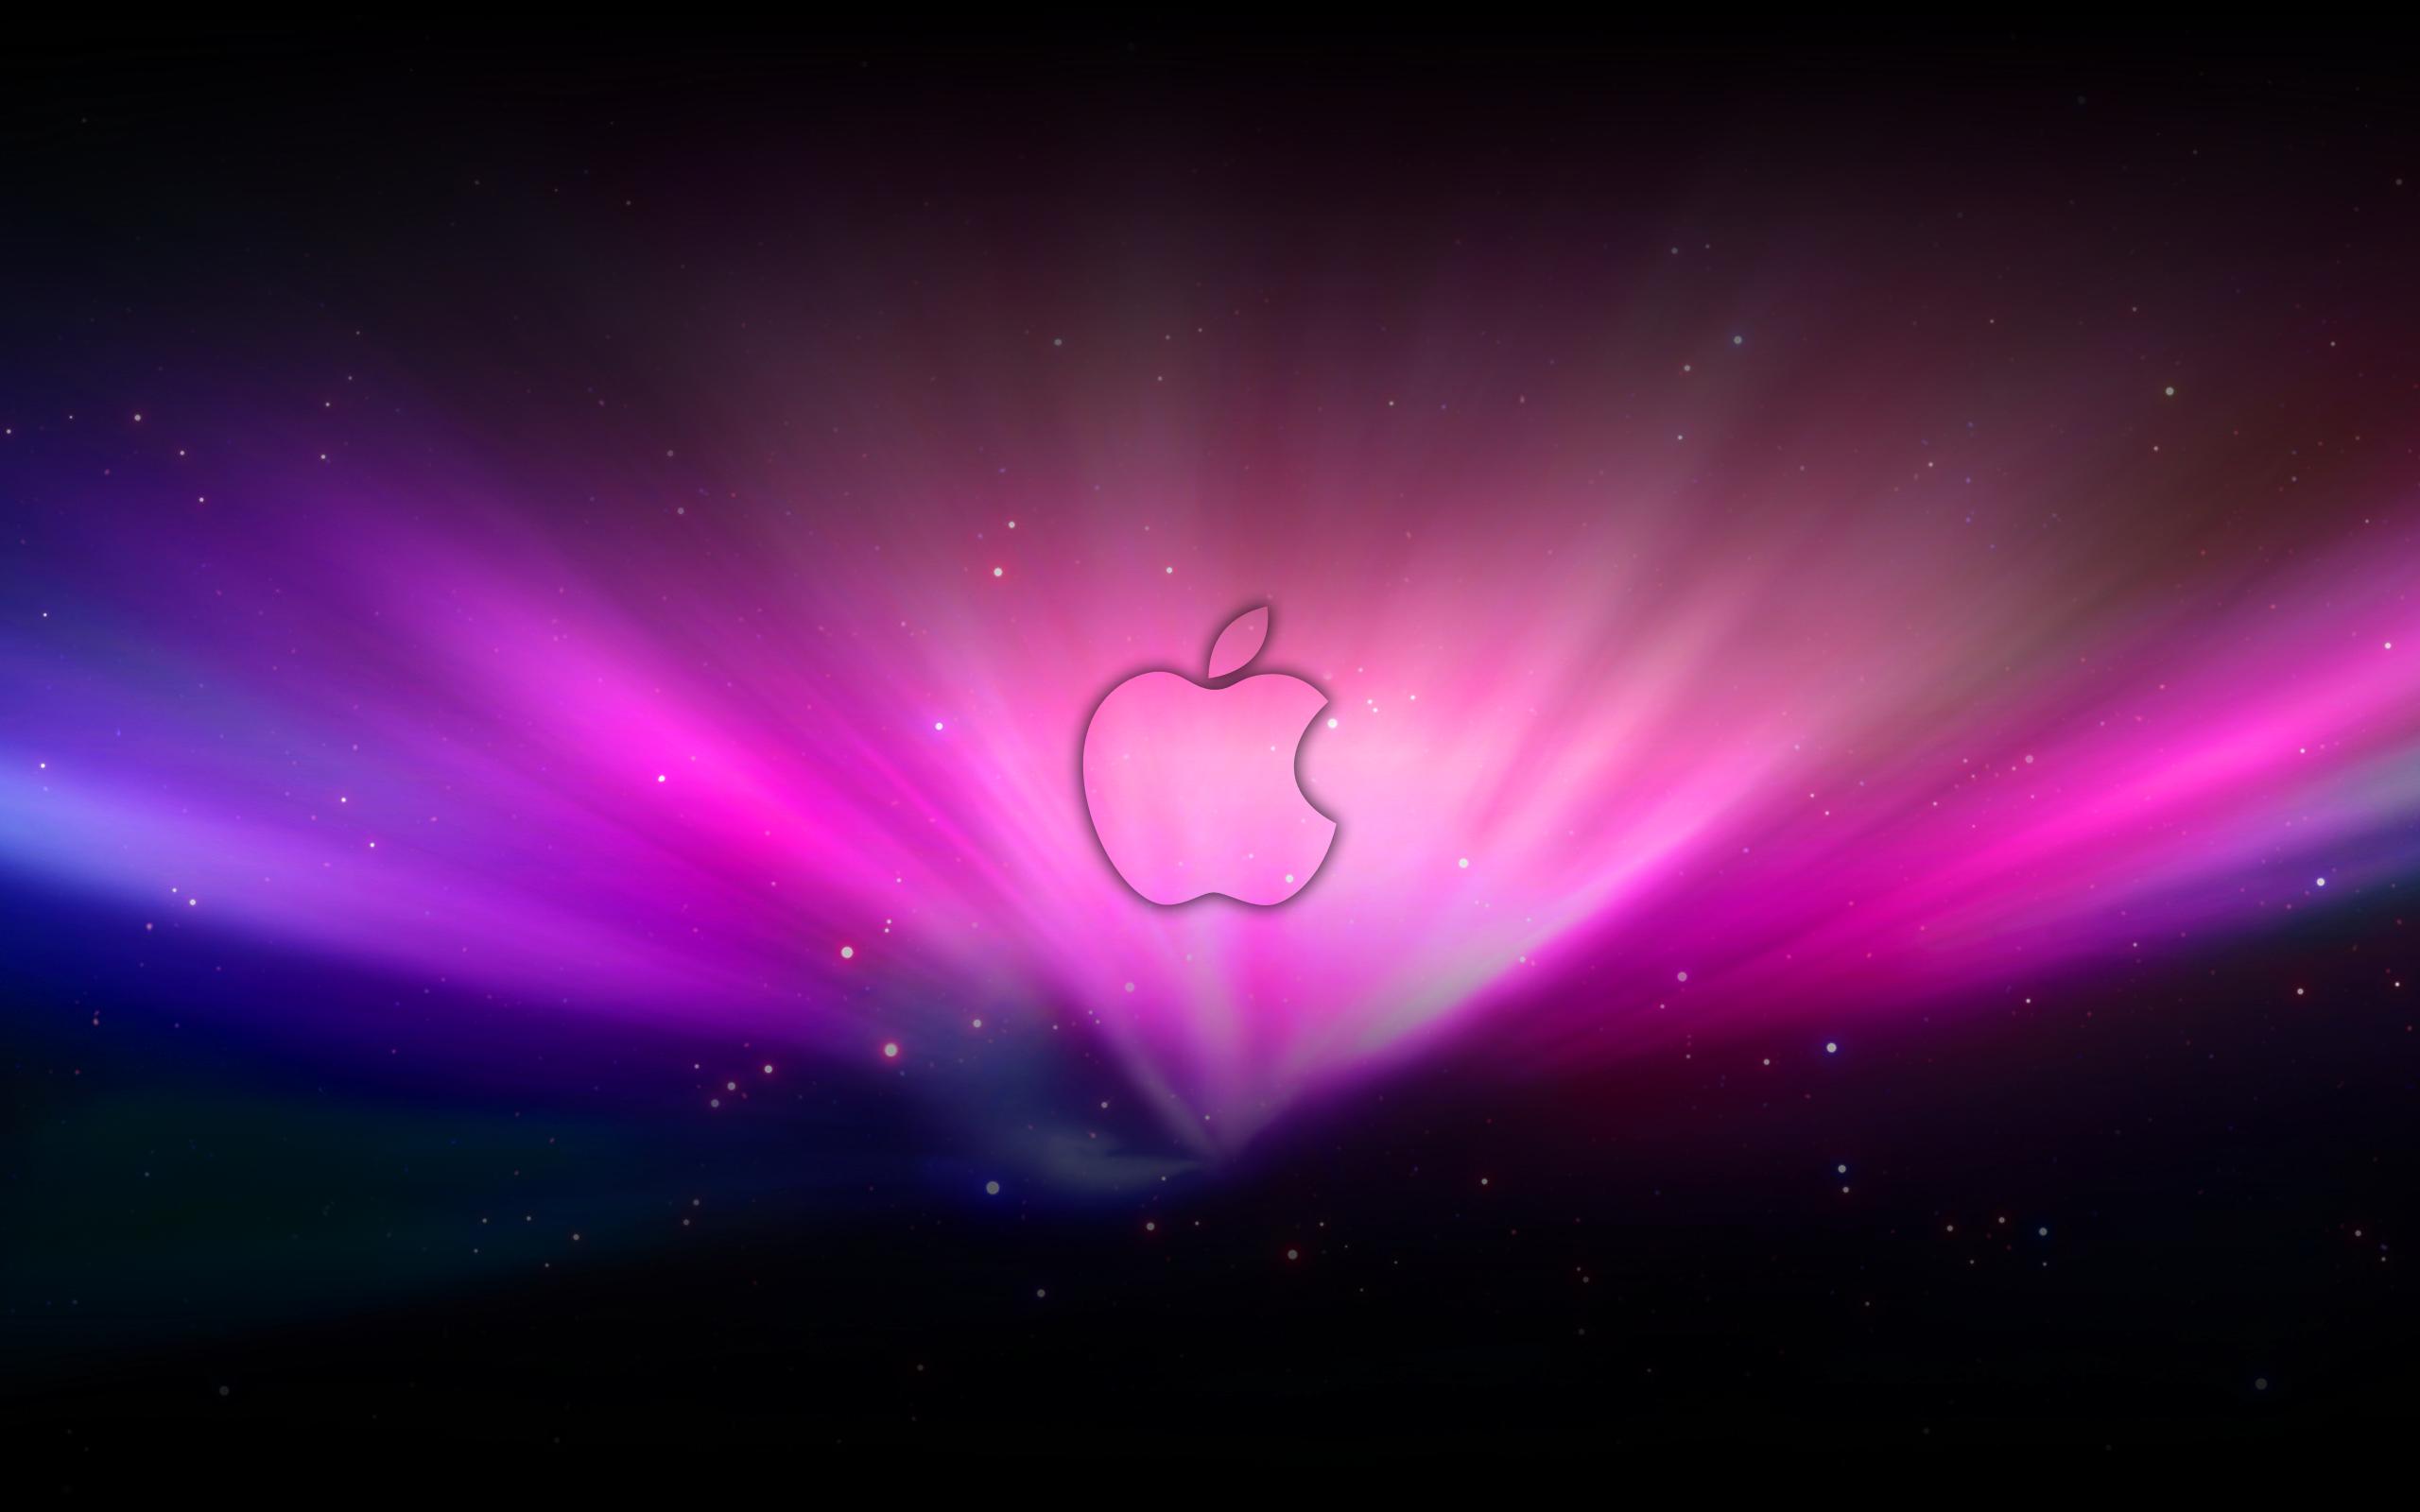 Mac OS X Leopard   Wallpaper 18795 2560x1600